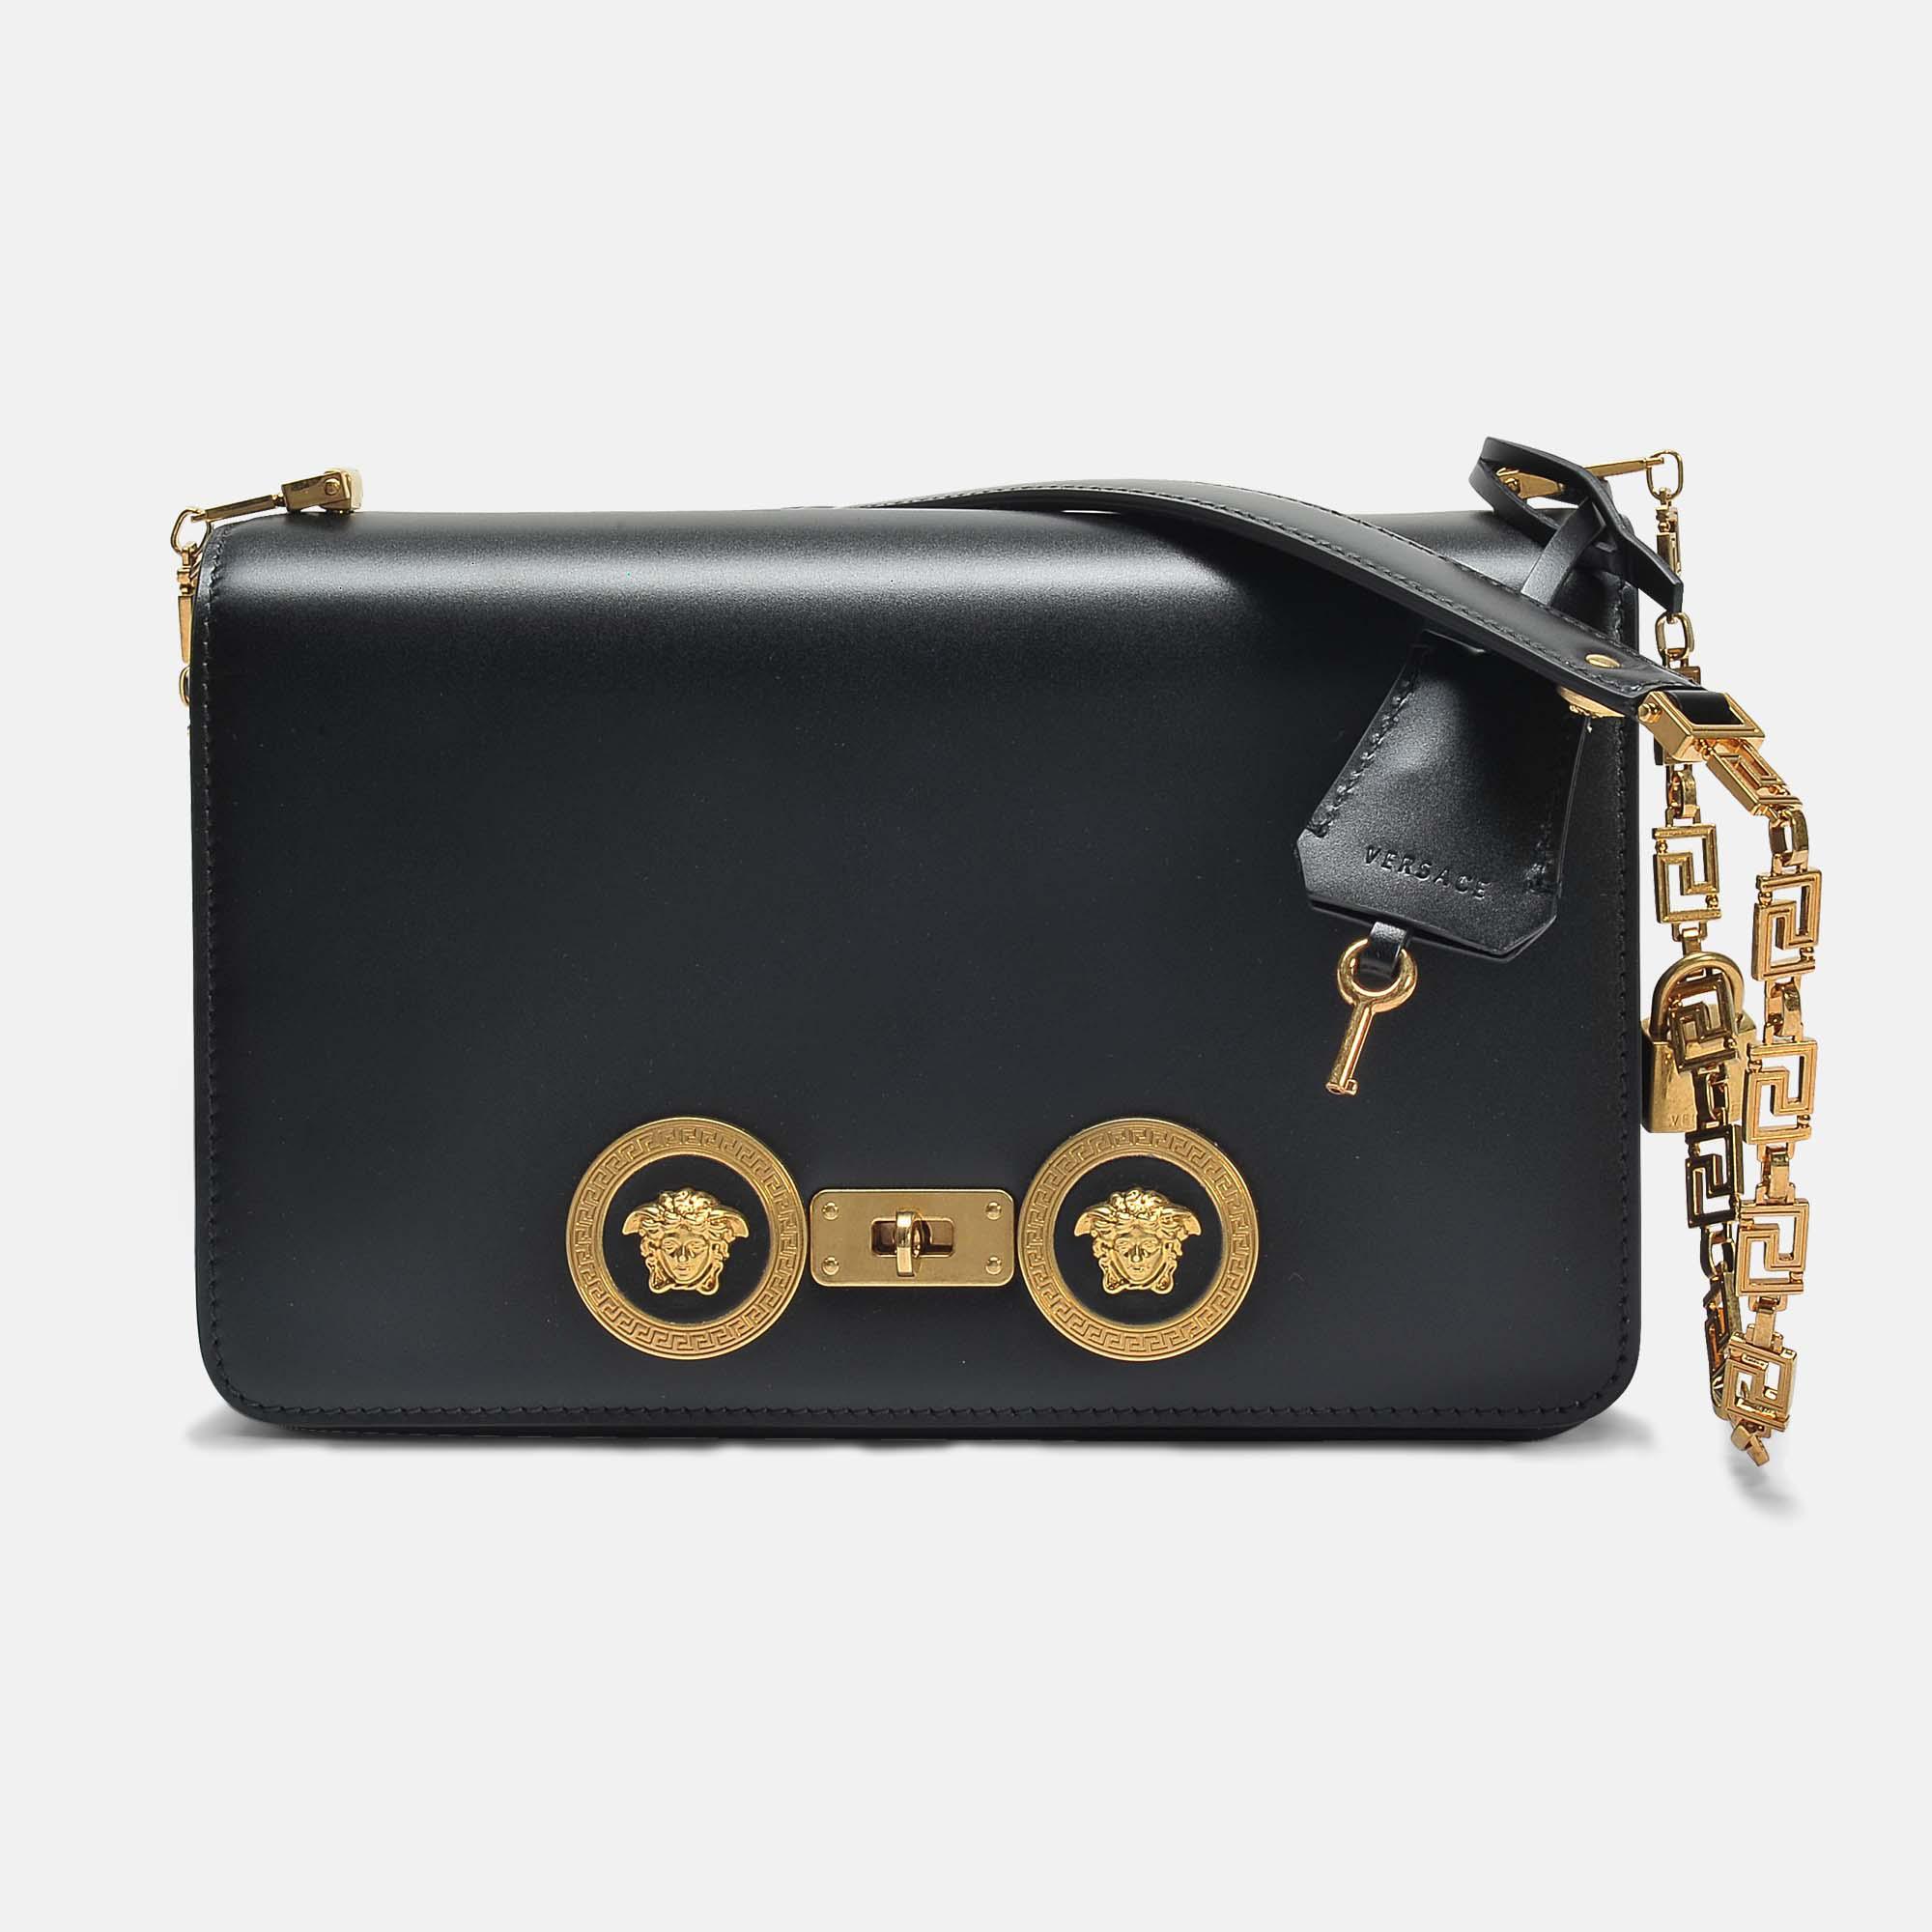 Versace Tribute Icon Small Shoulder Bag in Black Calfskin Versace yOabprD